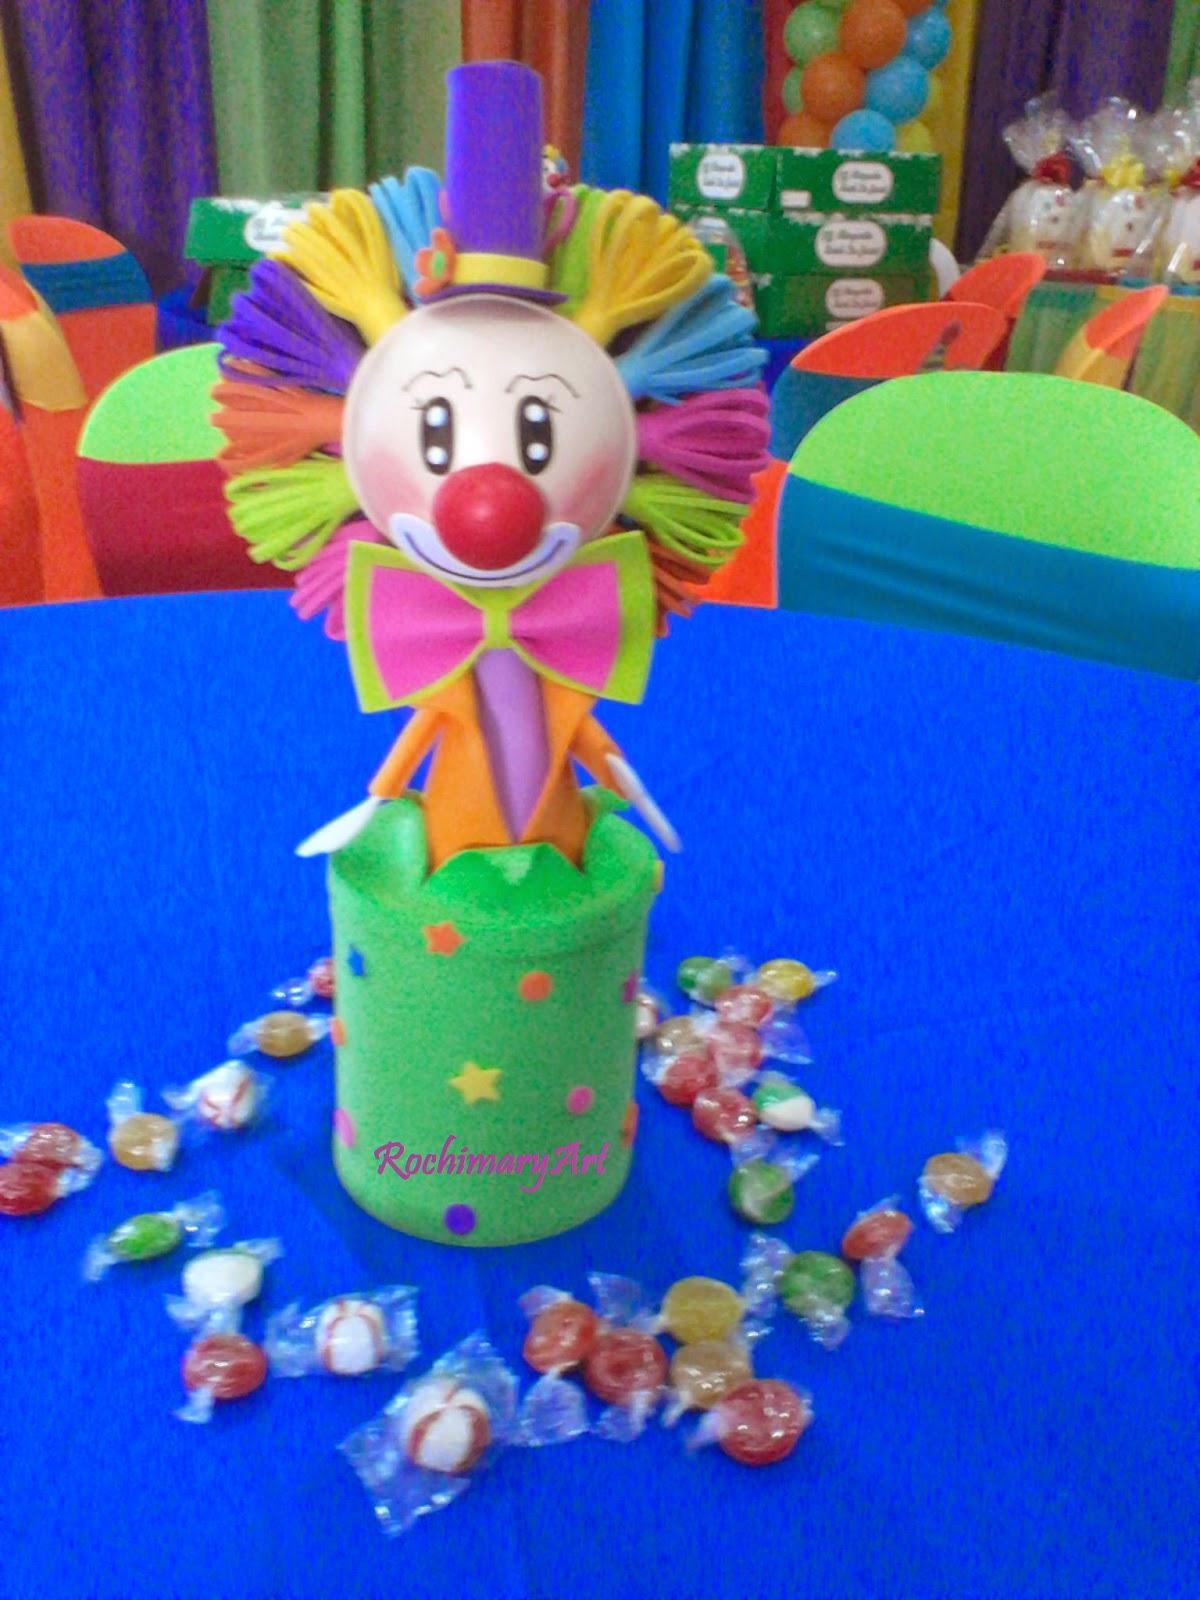 RochiMary Arte en Goma Eva: Fiesta payasos